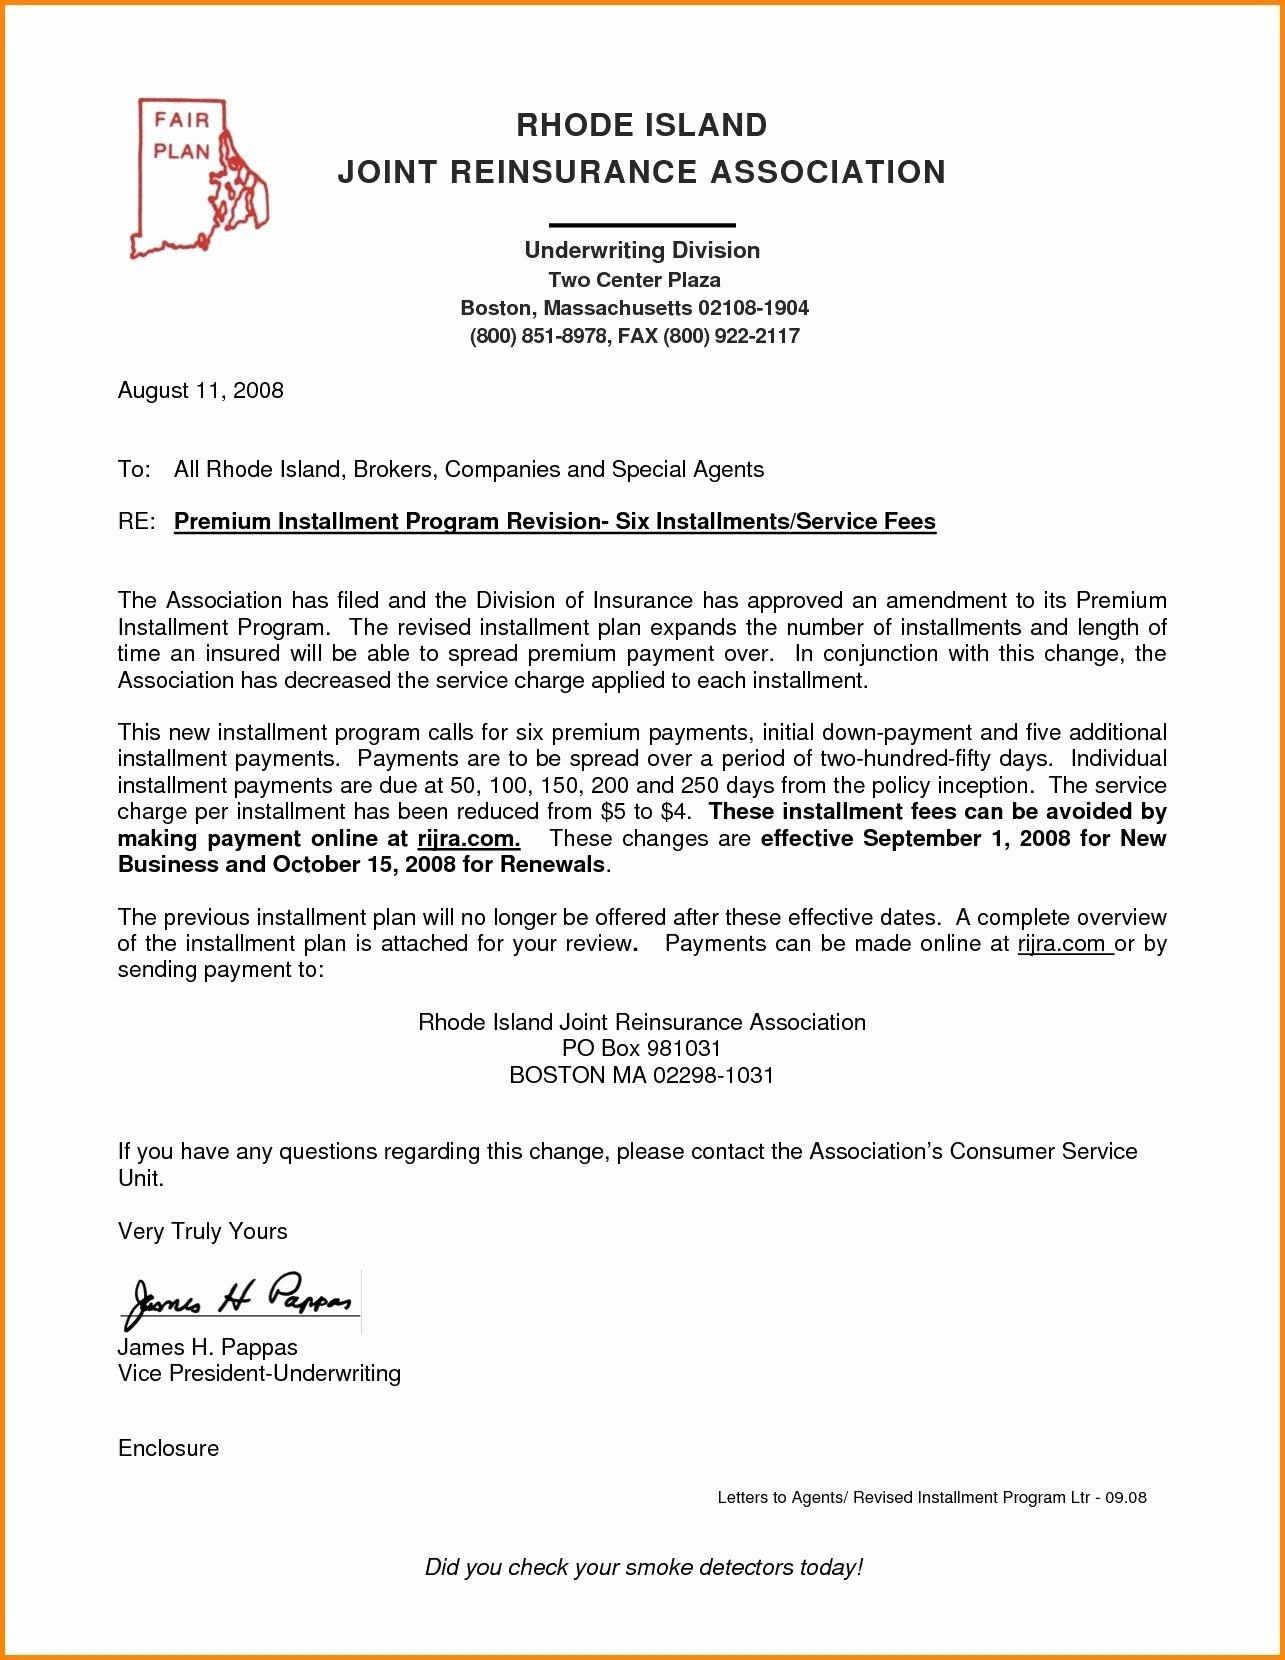 Business Letter Enclosure format Best Of formal Business Letter format with Enclosure